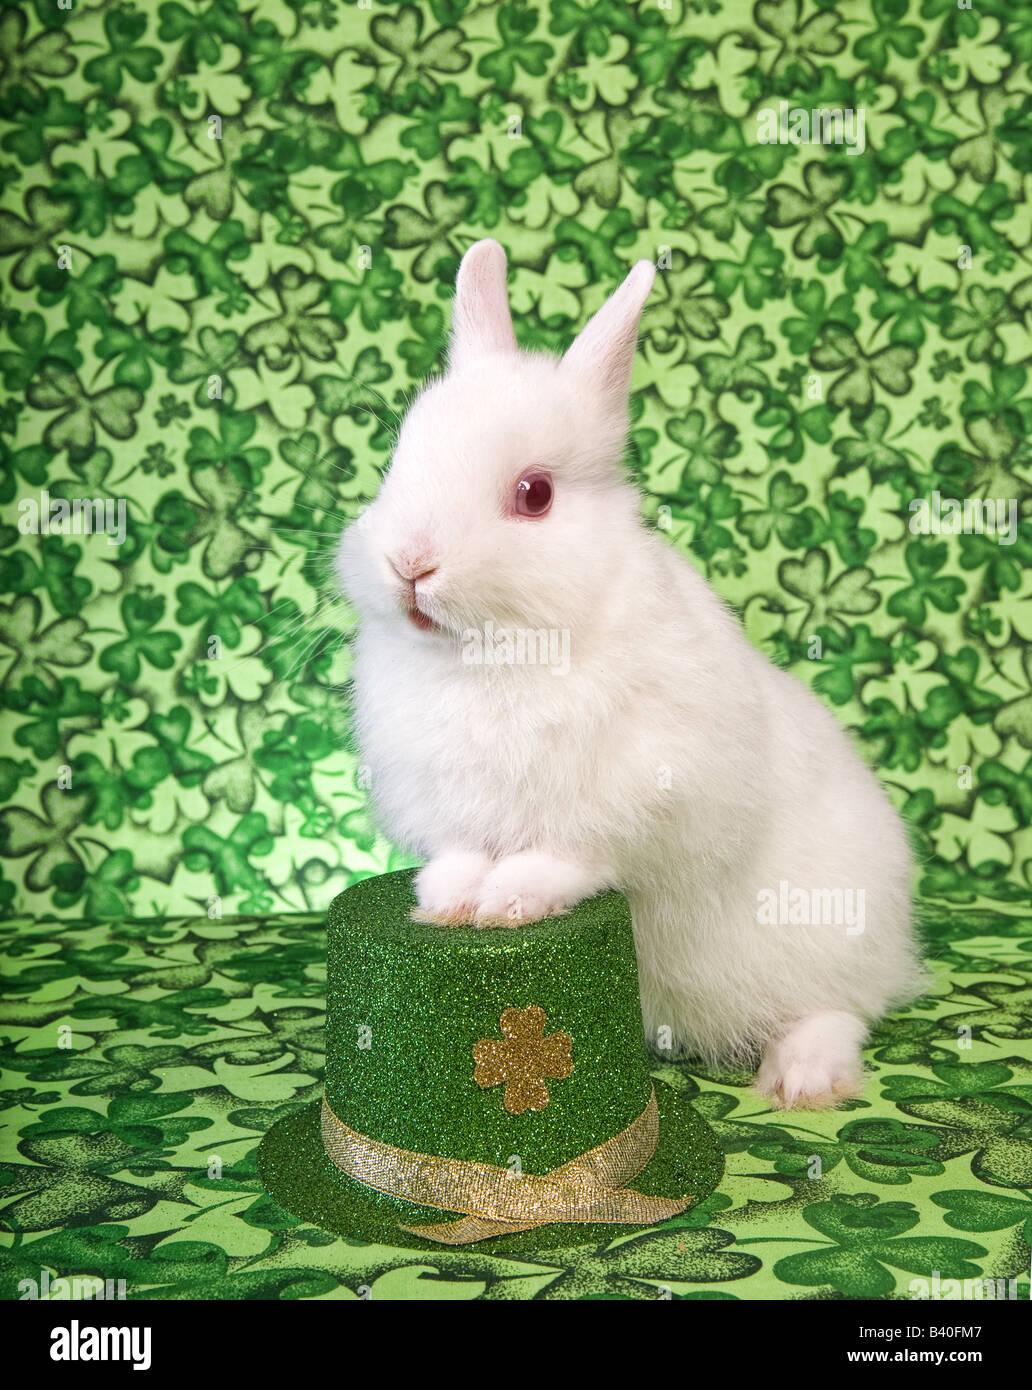 St Patricks Day white Netherland Dwarf Bunny Rabbit on green clover background with Irish hat - Stock Image